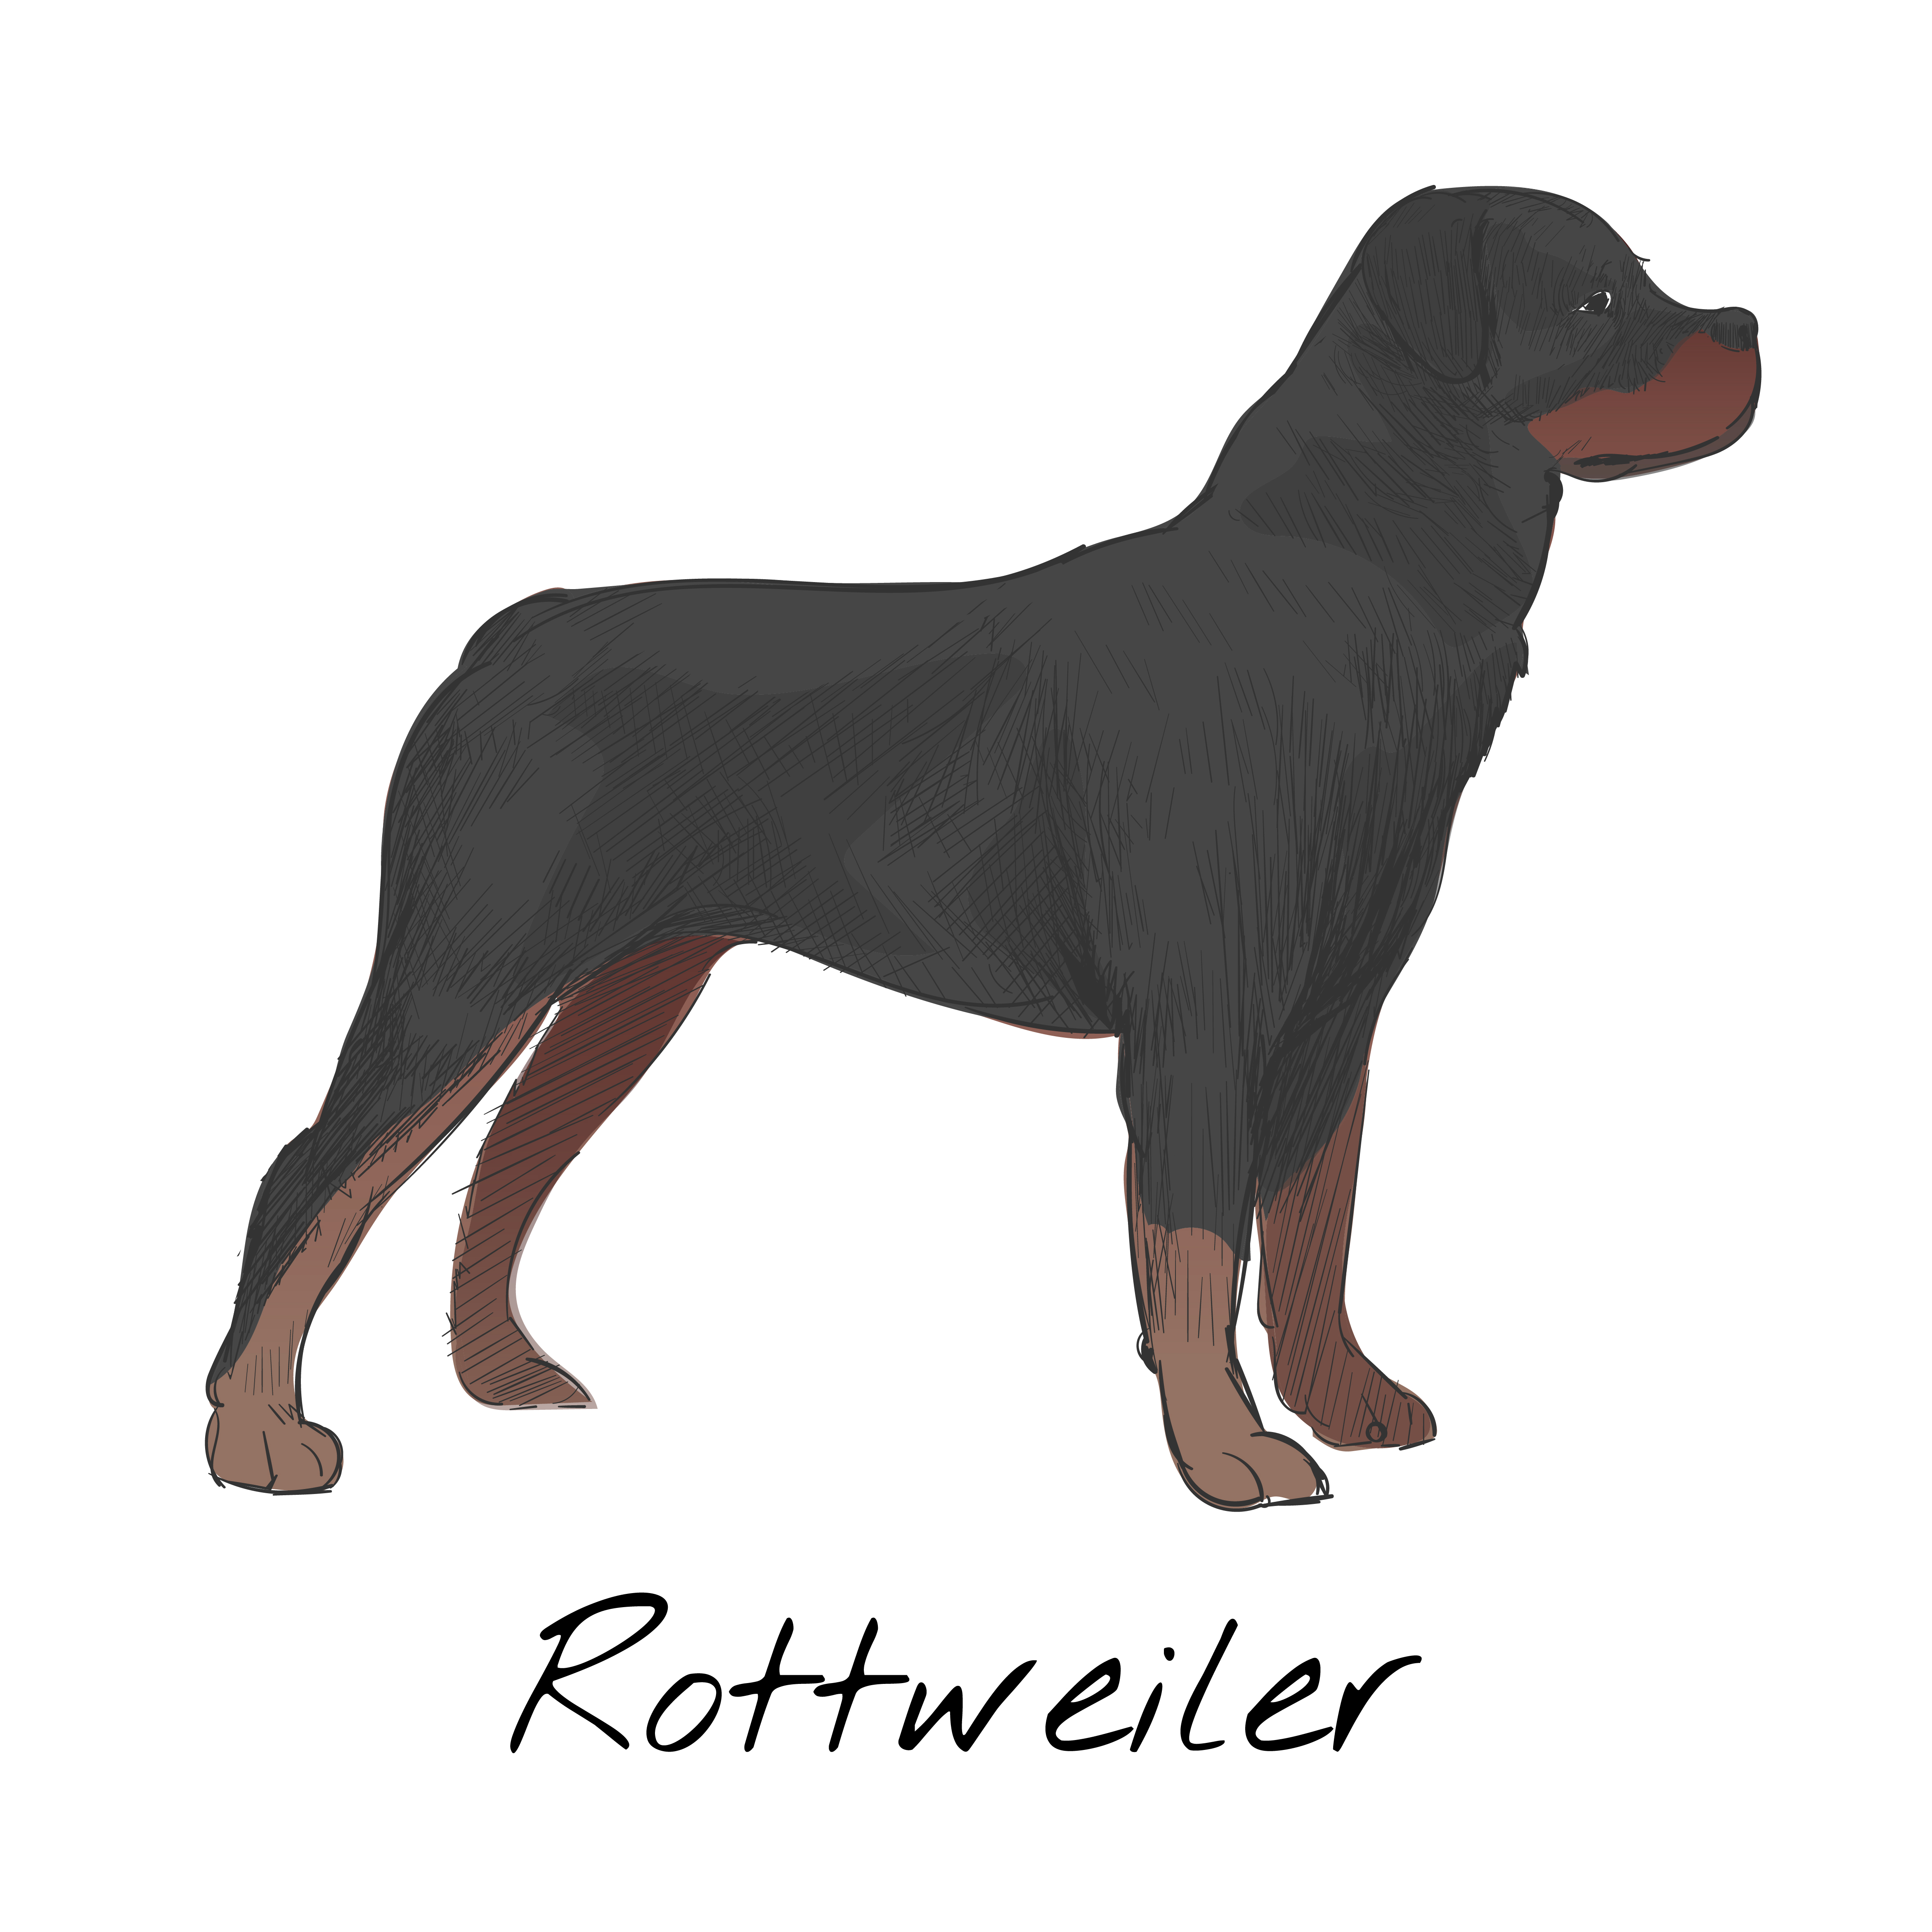 4681x4680 Illustration Drawing Style Of Dog